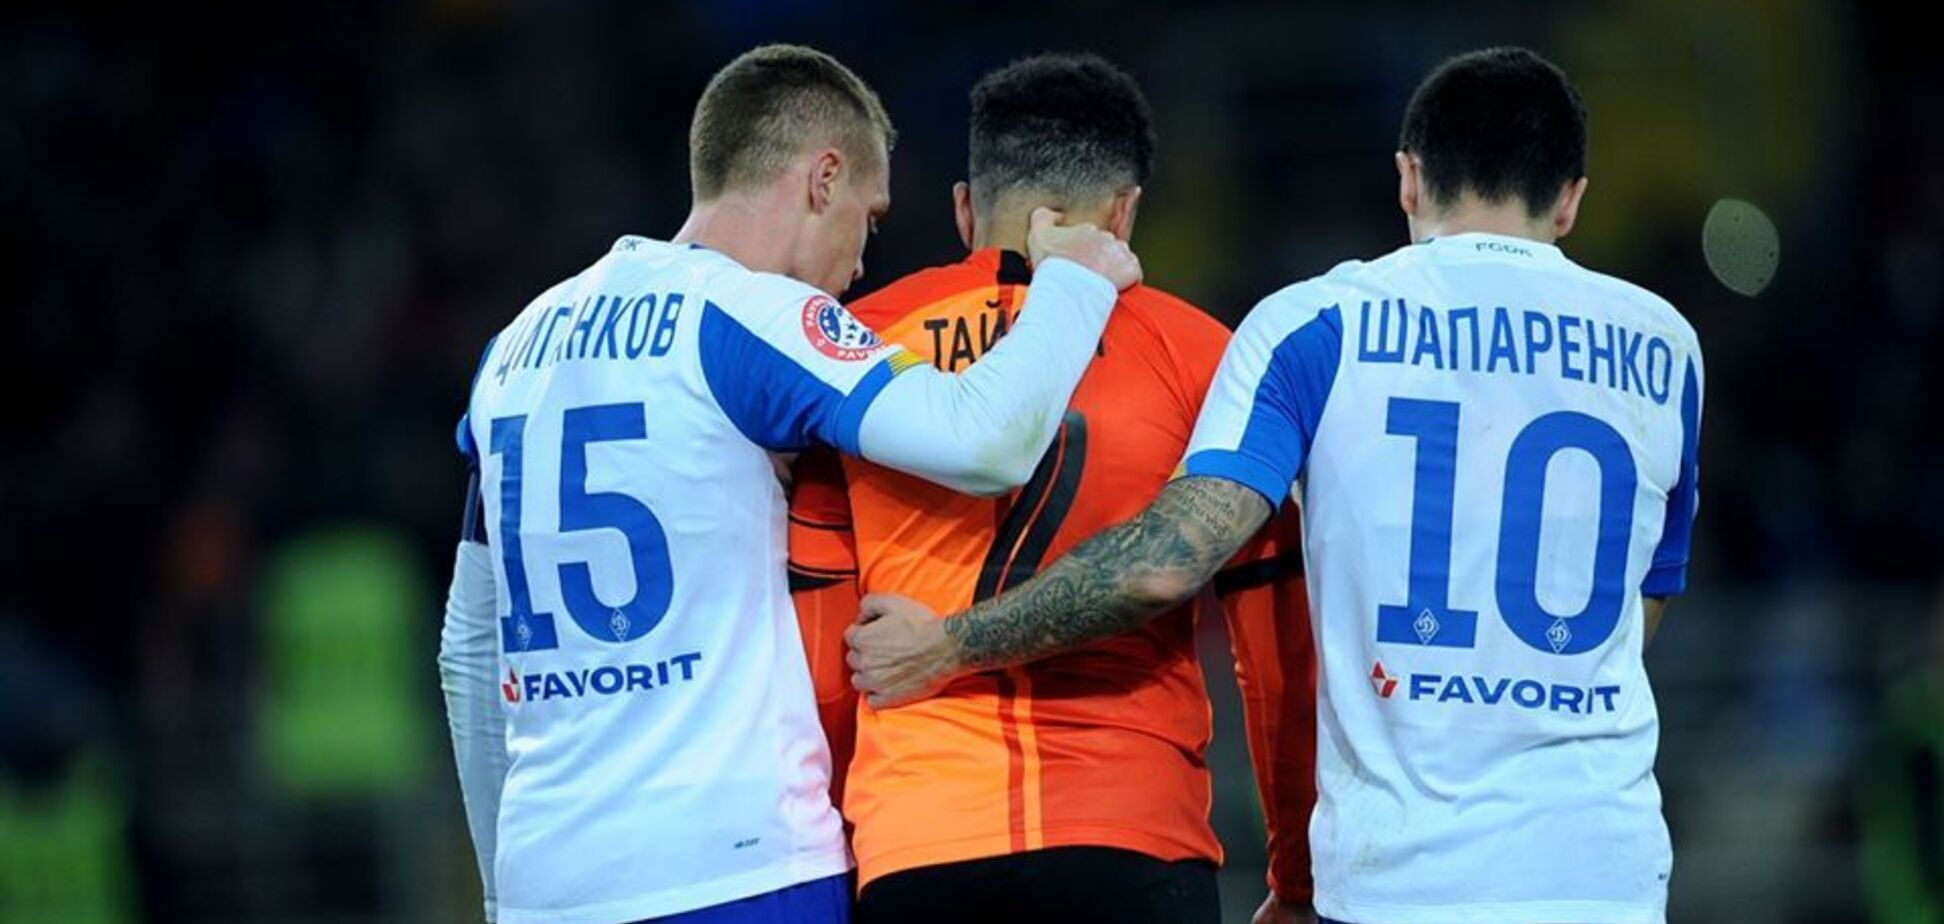 Скандал в матче 'Шахтер' – 'Динамо': Тайсон объяснил слезы